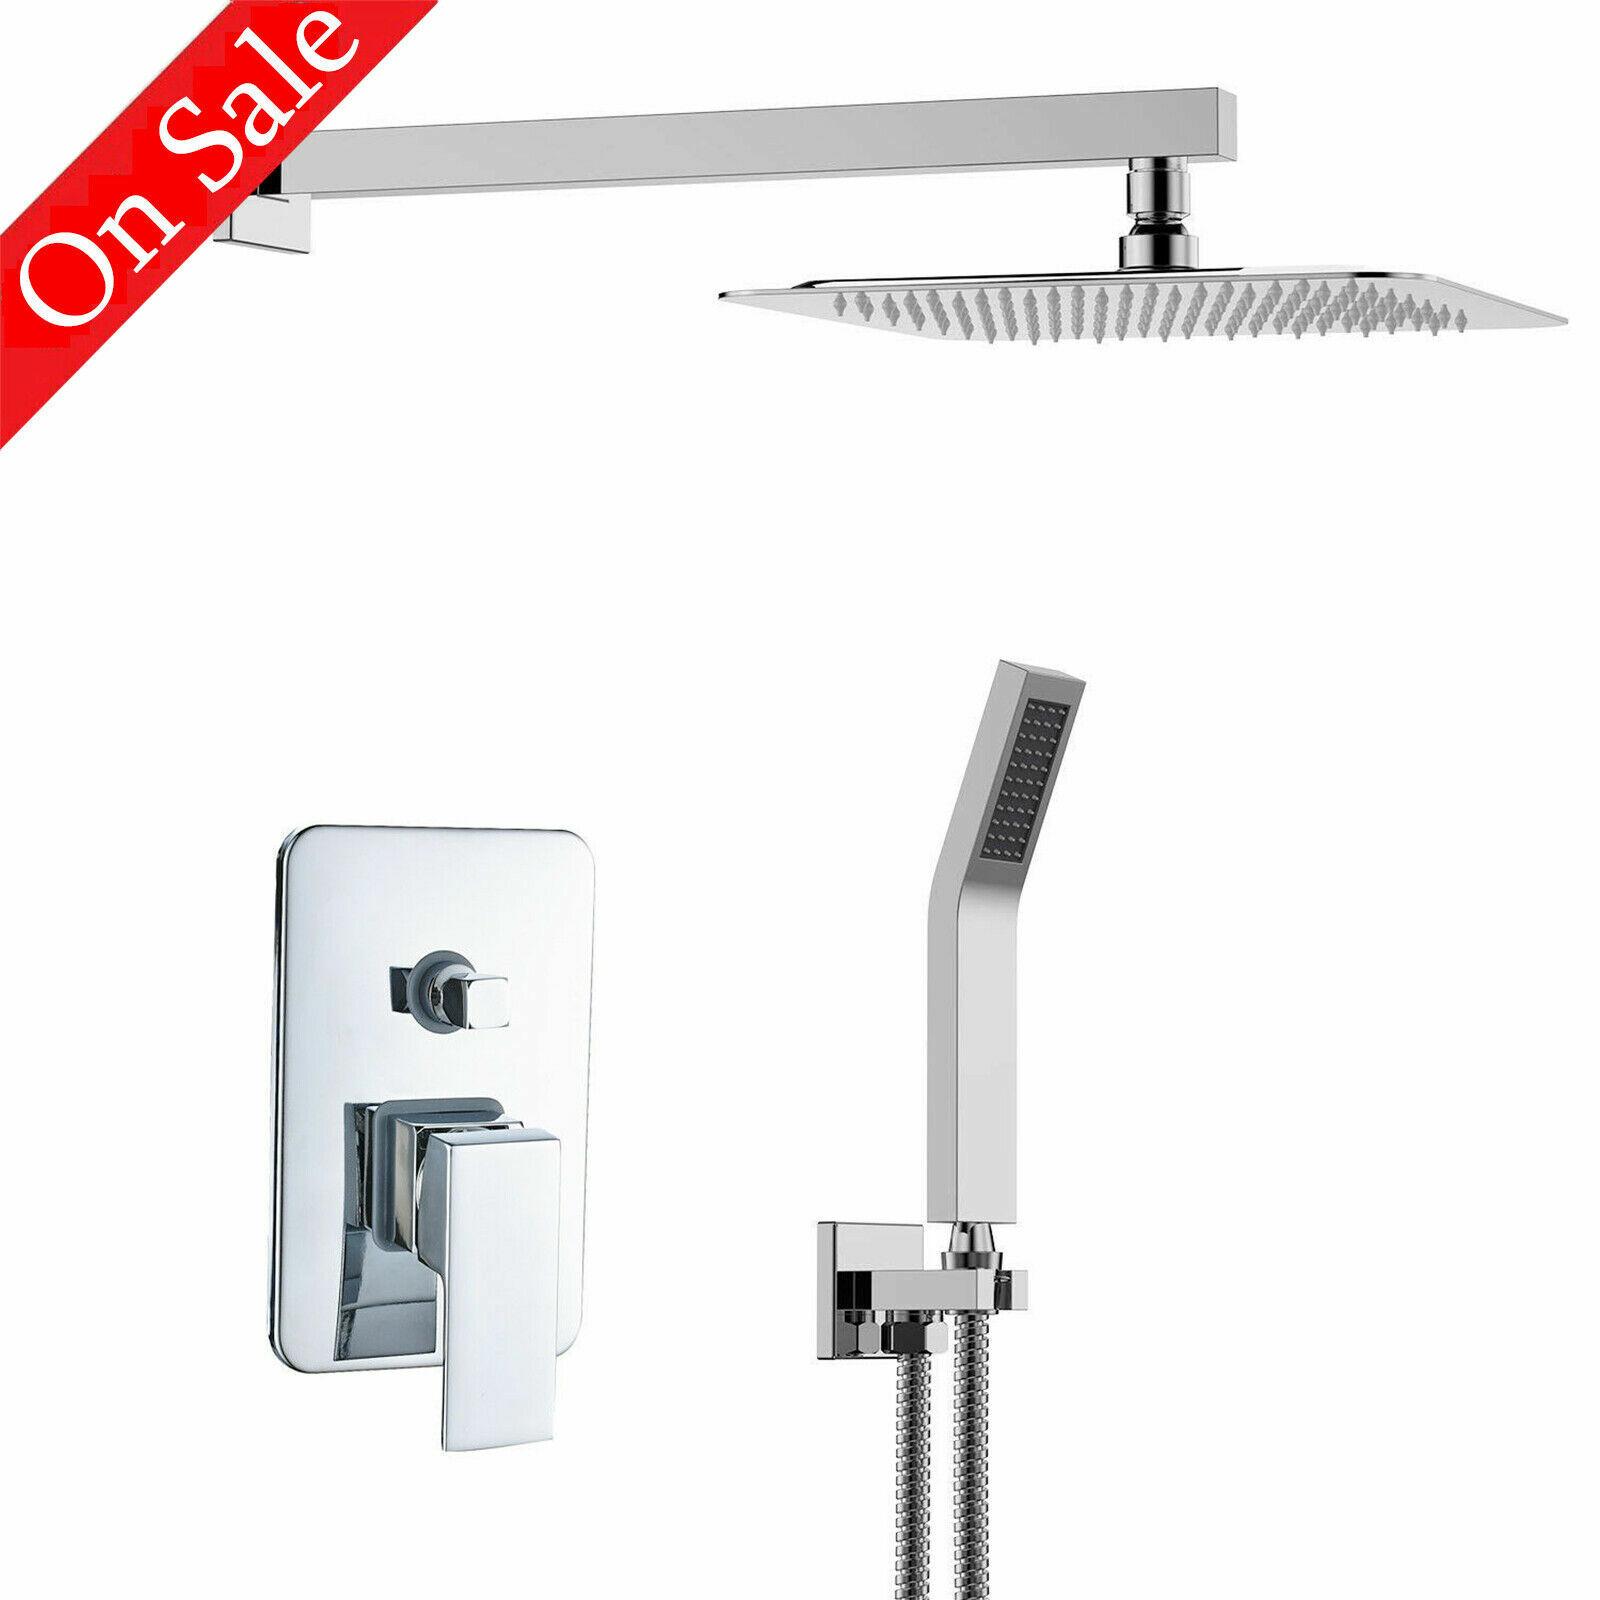 8 Single Handle Shower Faucet Trim Valve Hand Shower Complete Kit Square Chrome